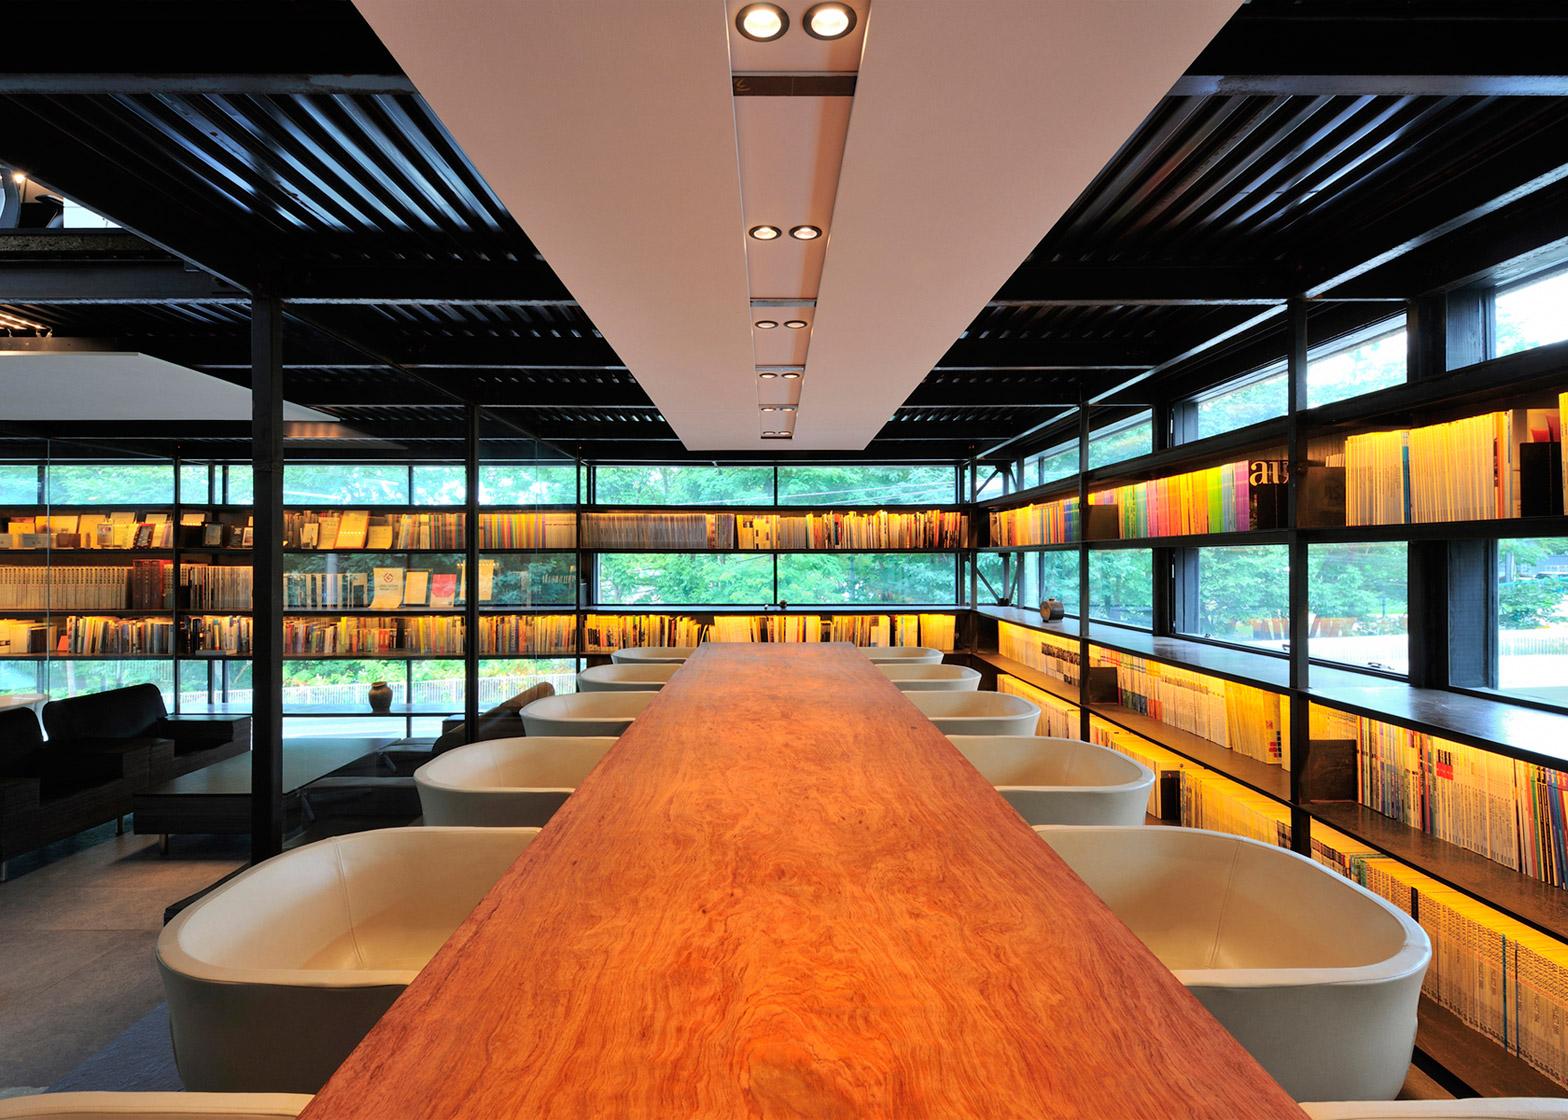 HIGO, Sapporo, Hokkaido, Japan, by Nakayama Architects